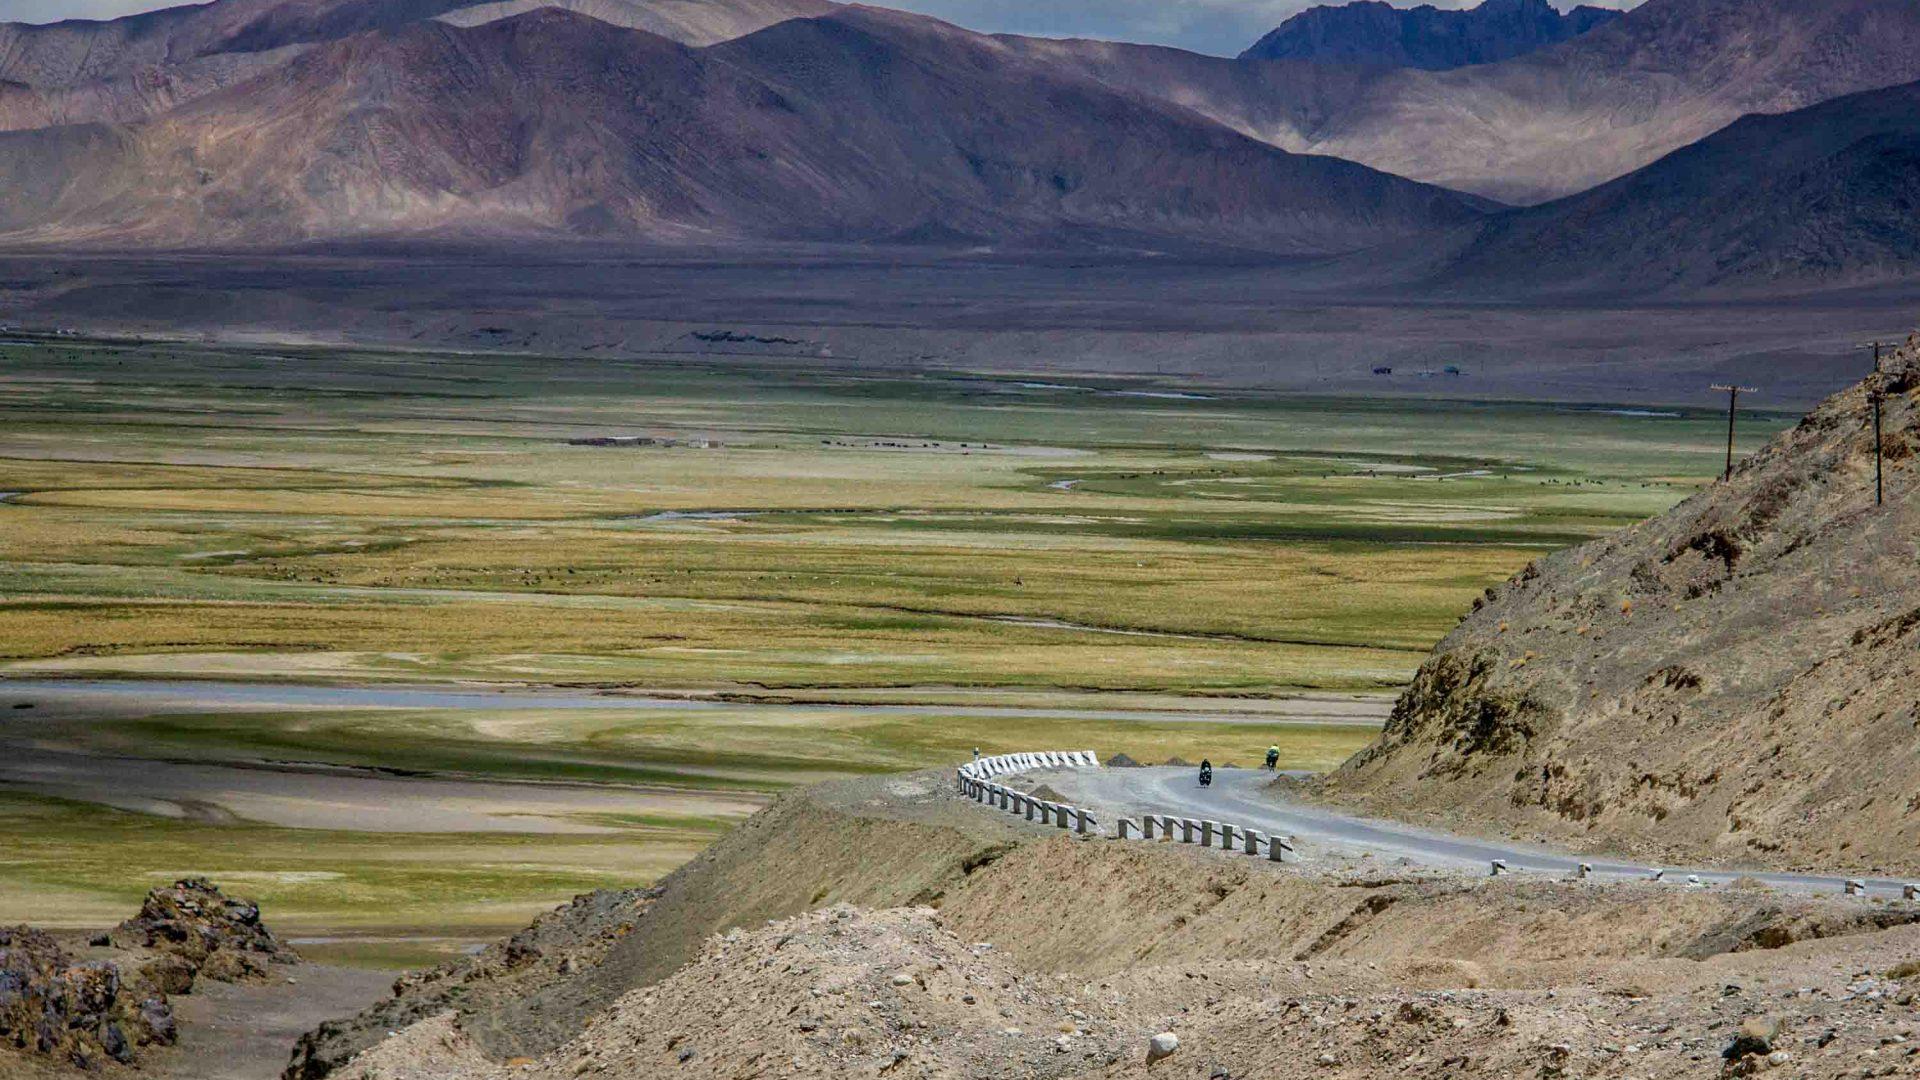 Murghab plain, Tajikistan.